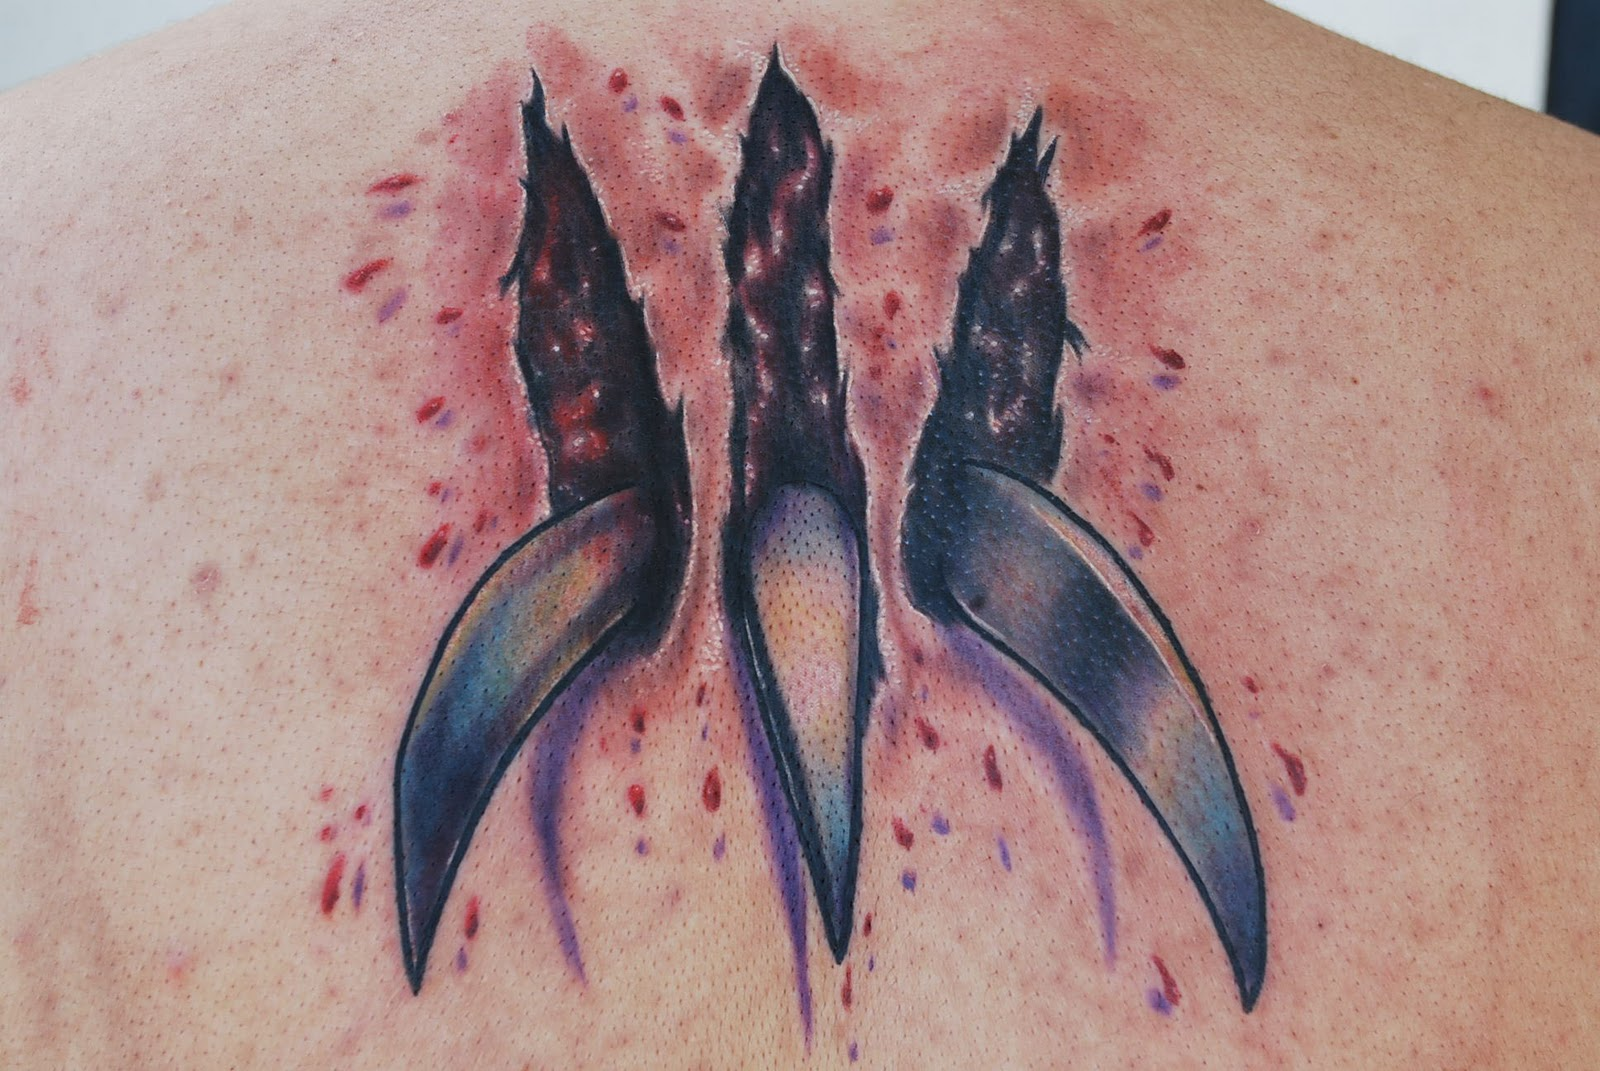 http://2.bp.blogspot.com/-0rI0bAdr6Fg/Tr1-V6AJXlI/AAAAAAAAALo/o667GXbp4i0/s1600/Realistic+Wolverine+Skin+Tear+Tattoo.jpg